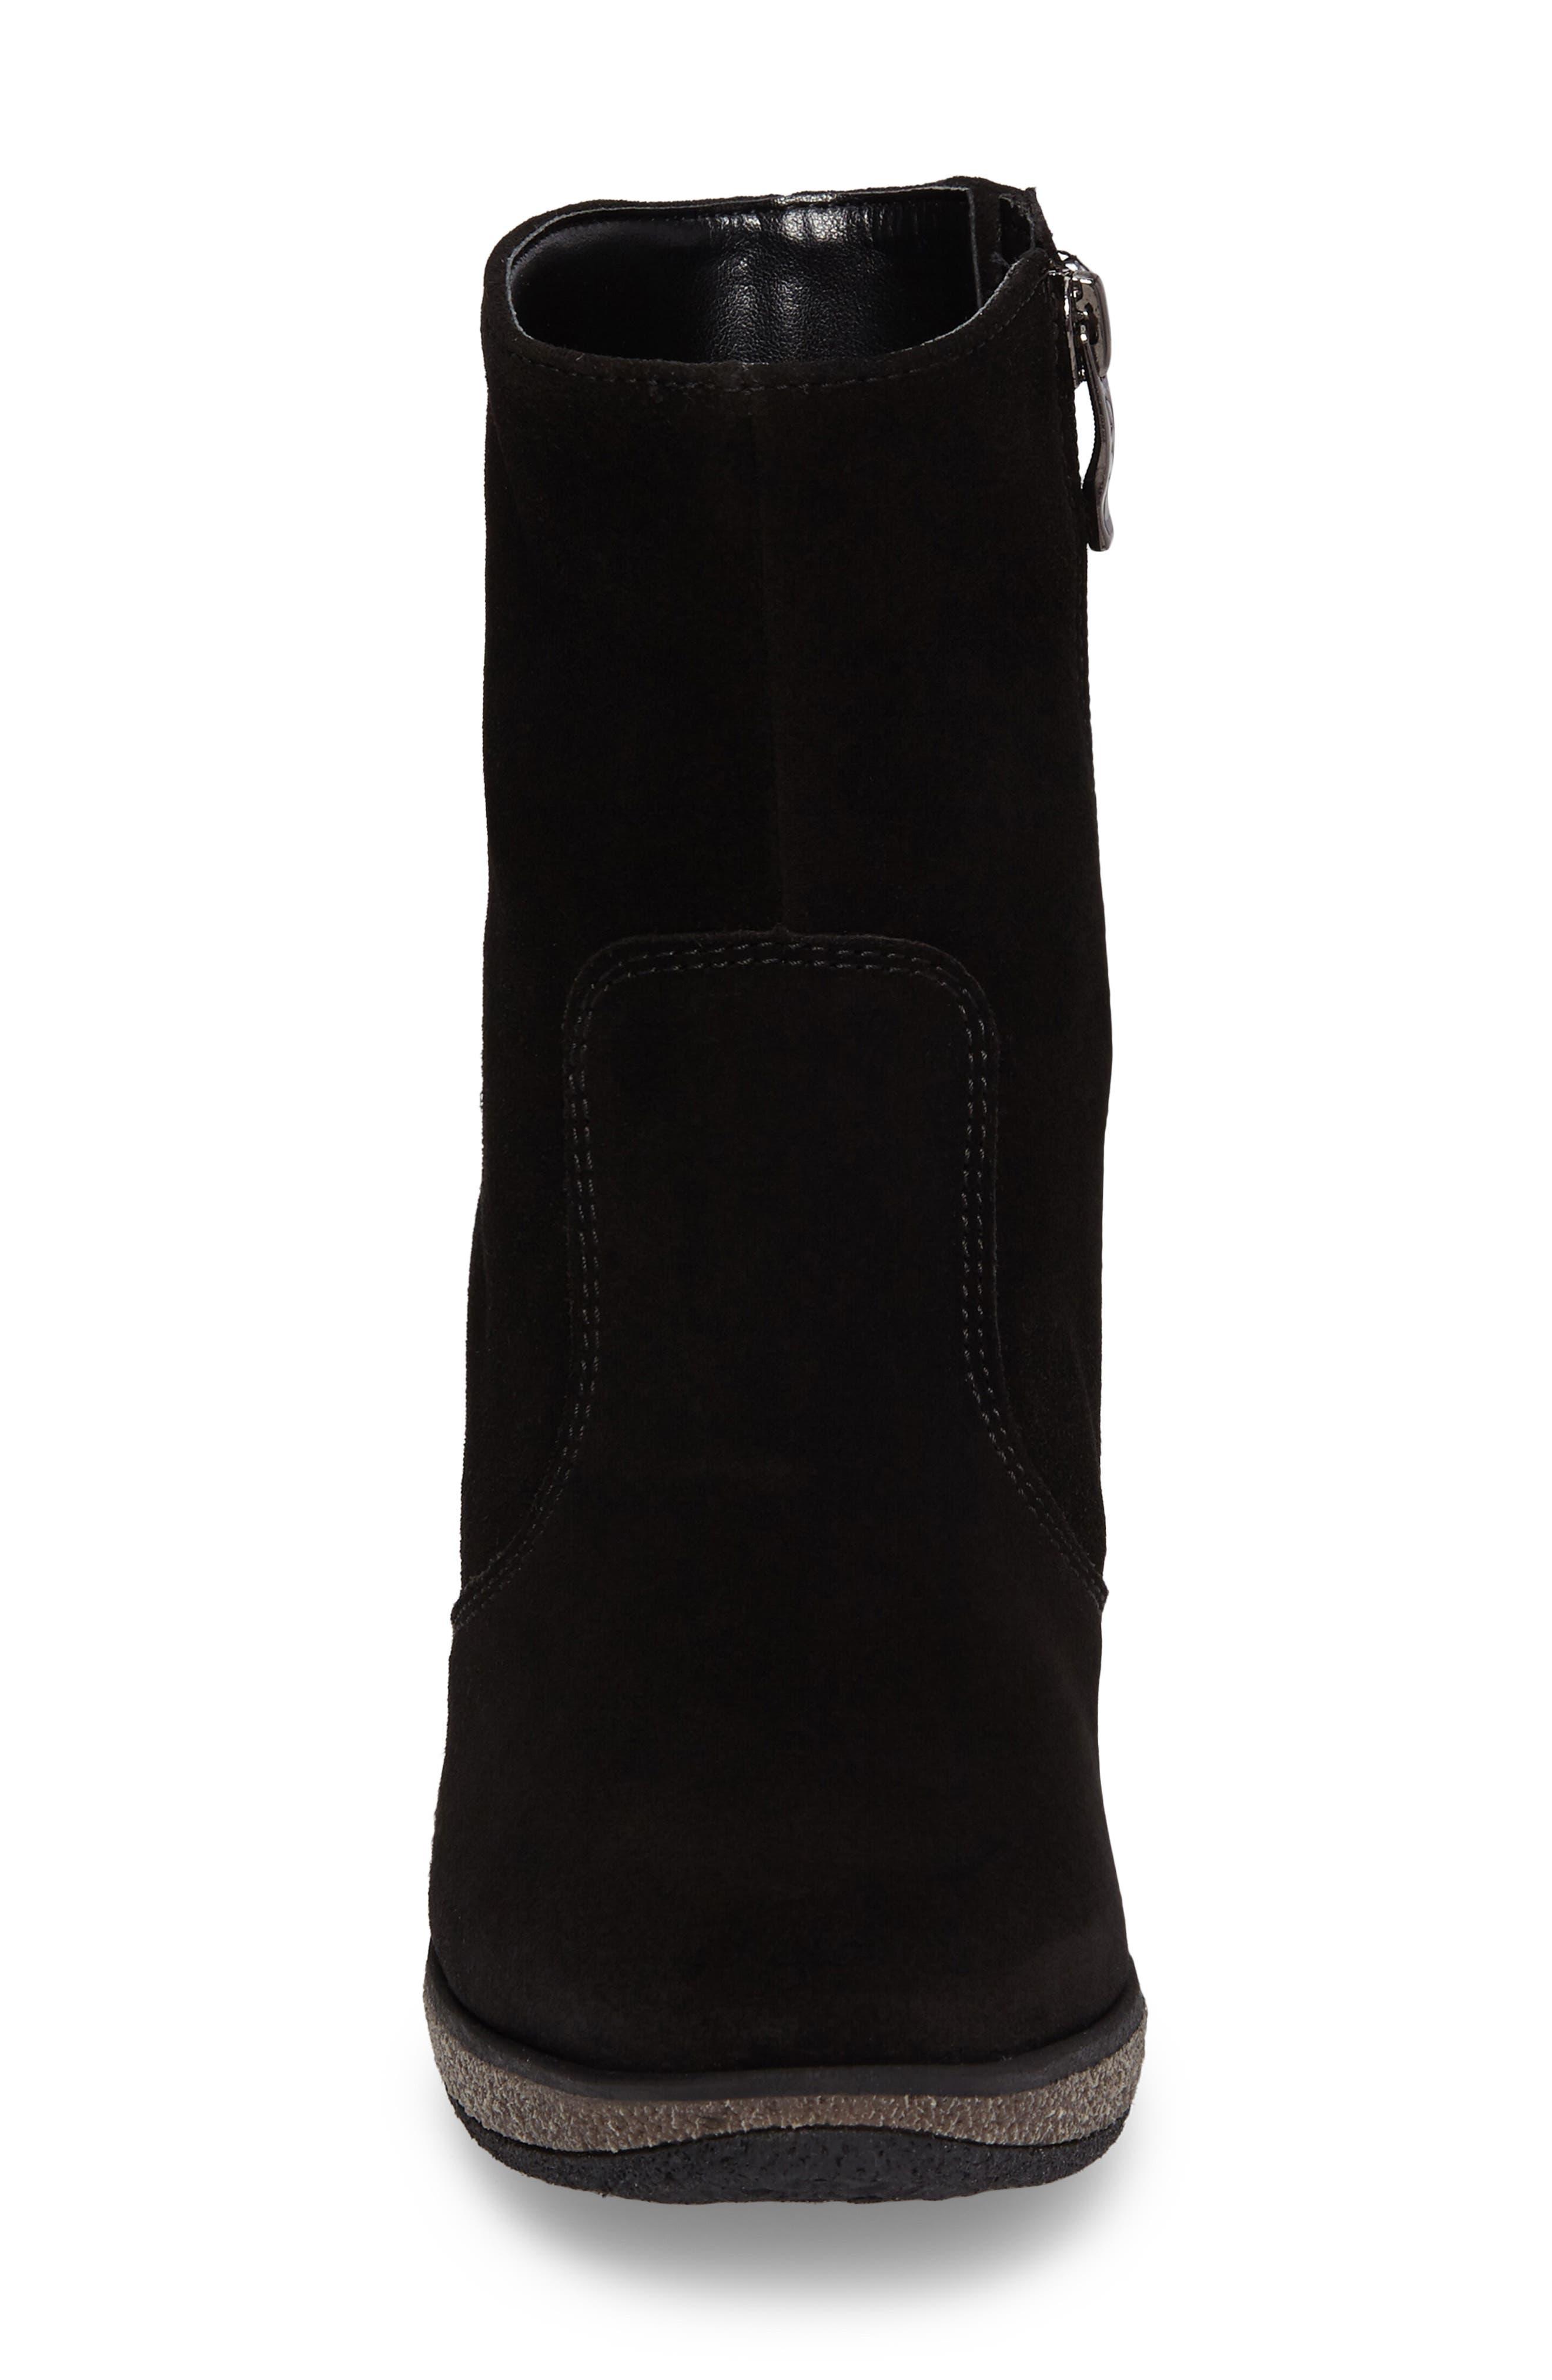 Bristol Bootie,                             Alternate thumbnail 4, color,                             Black Leather